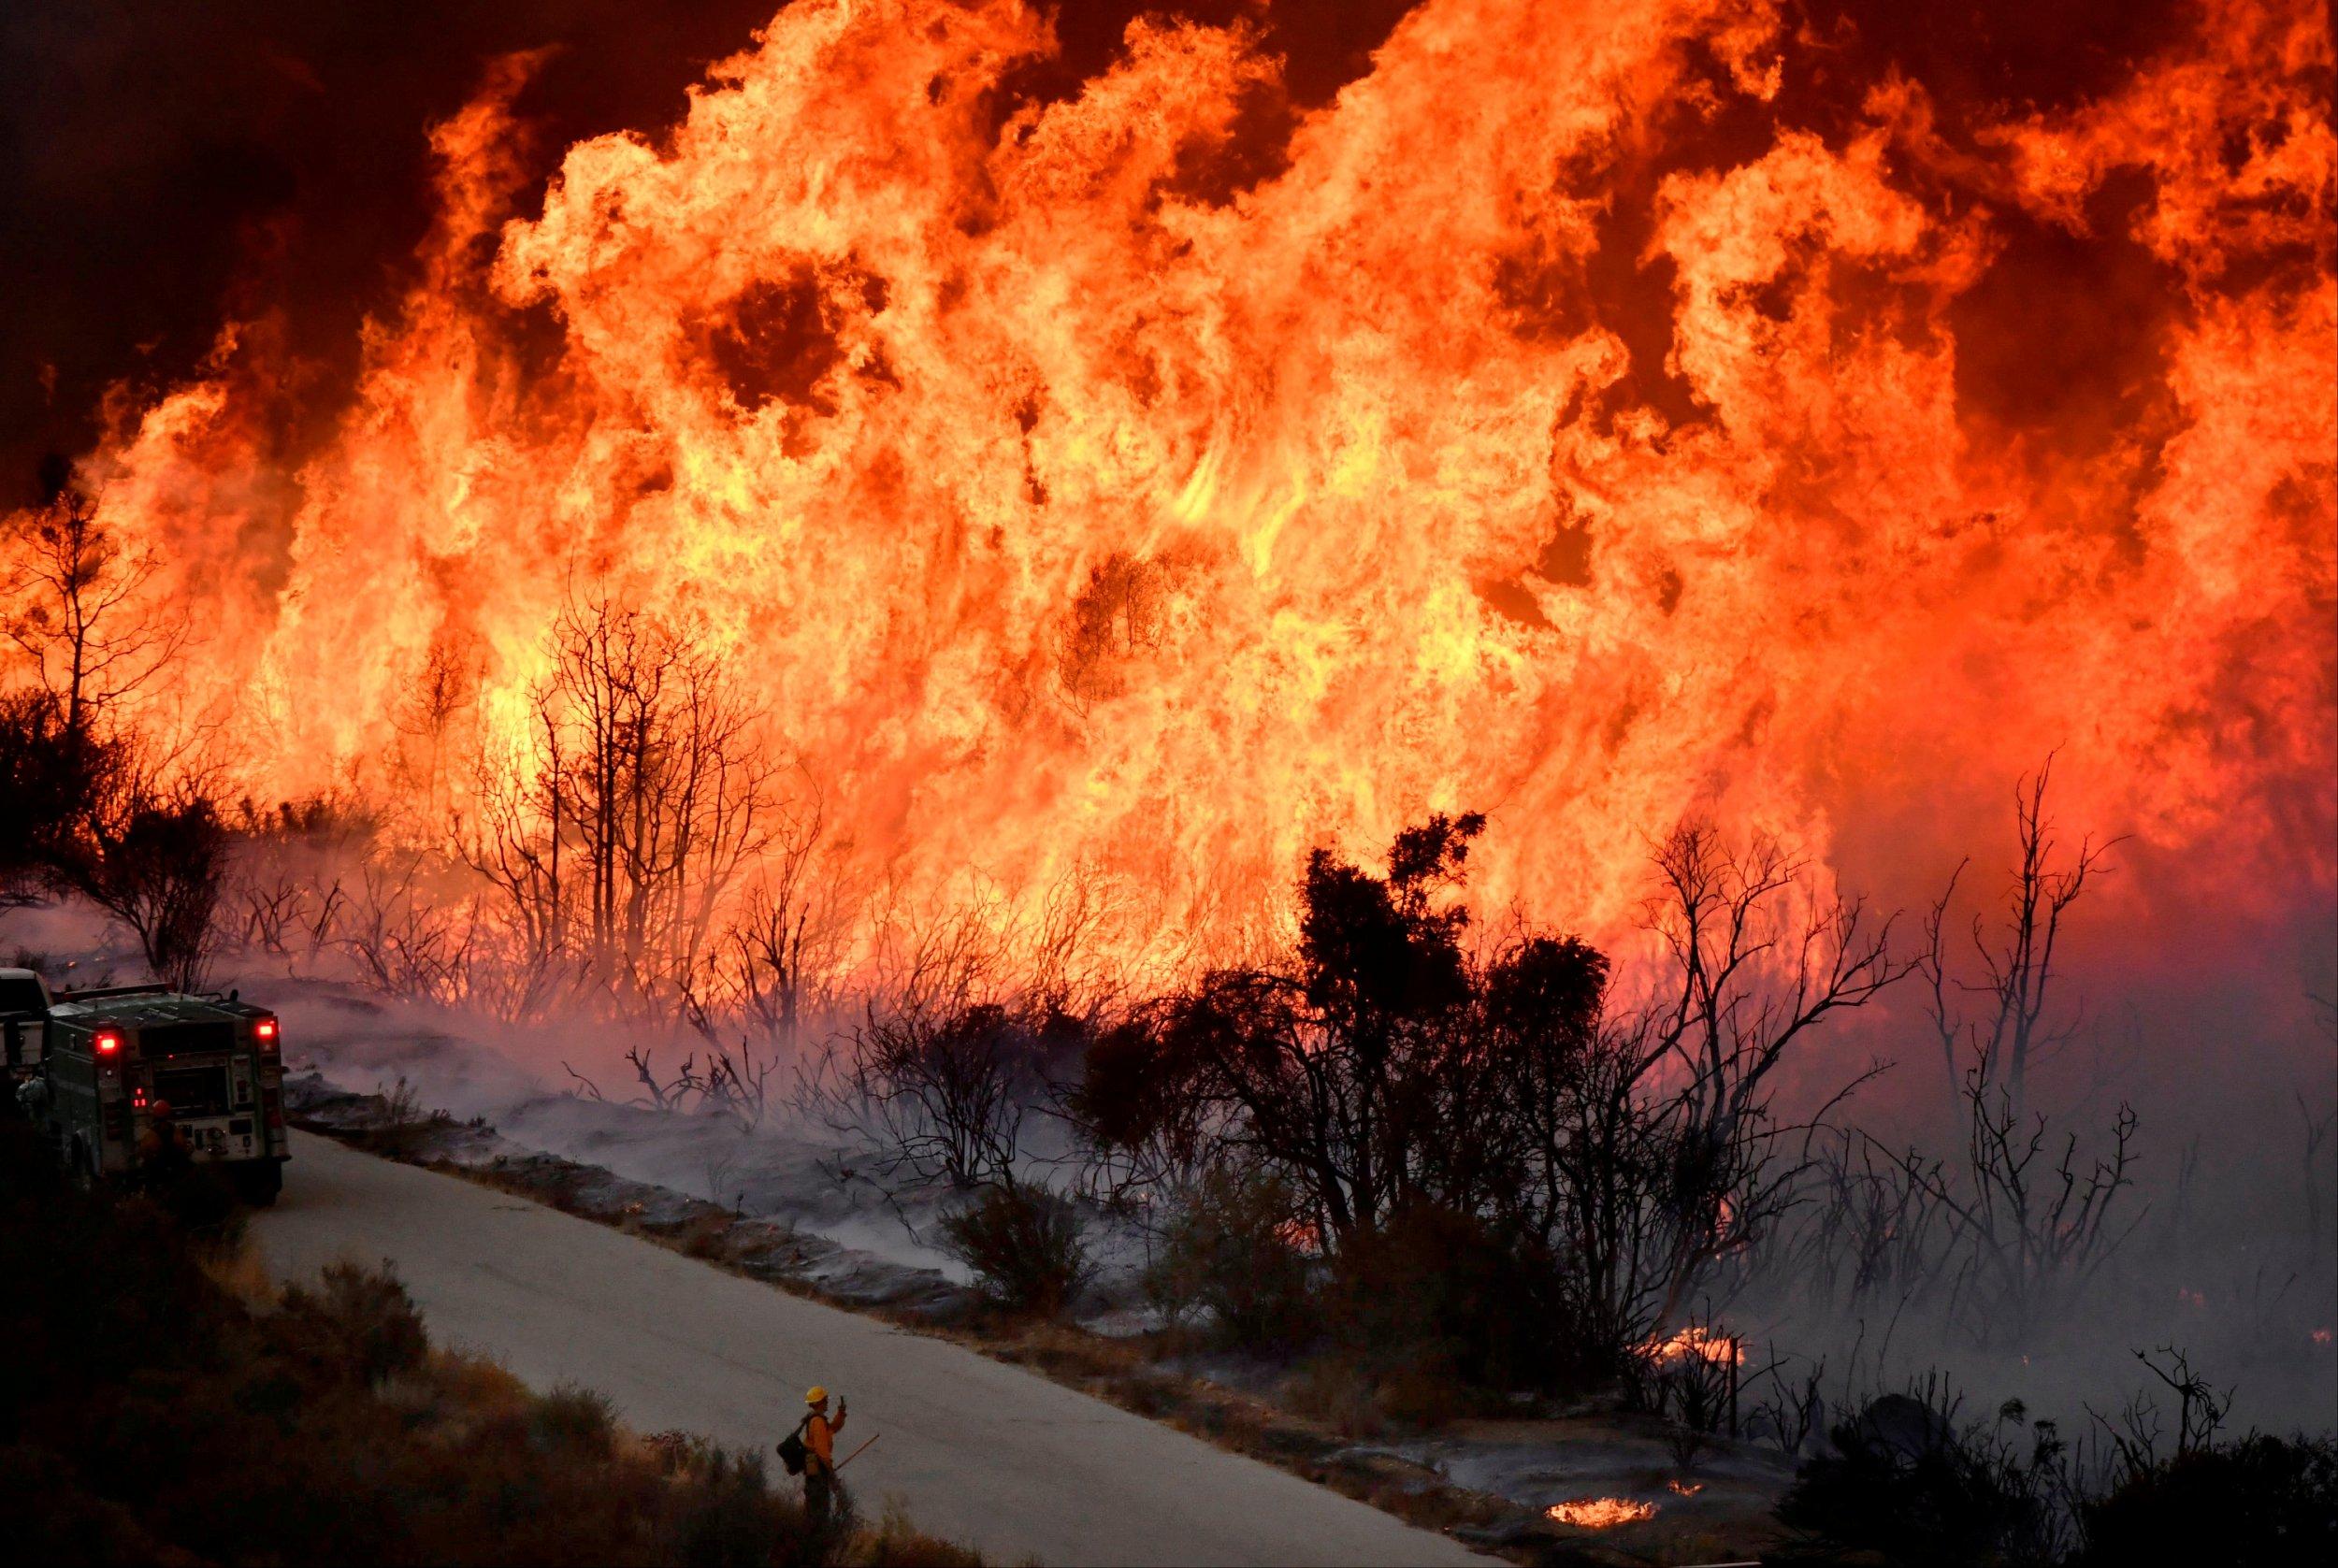 Ventura California Fire >> California Fire Map Update: Photos Of Destruction Across Los Angeles, Santa Barbara and Ventura ...